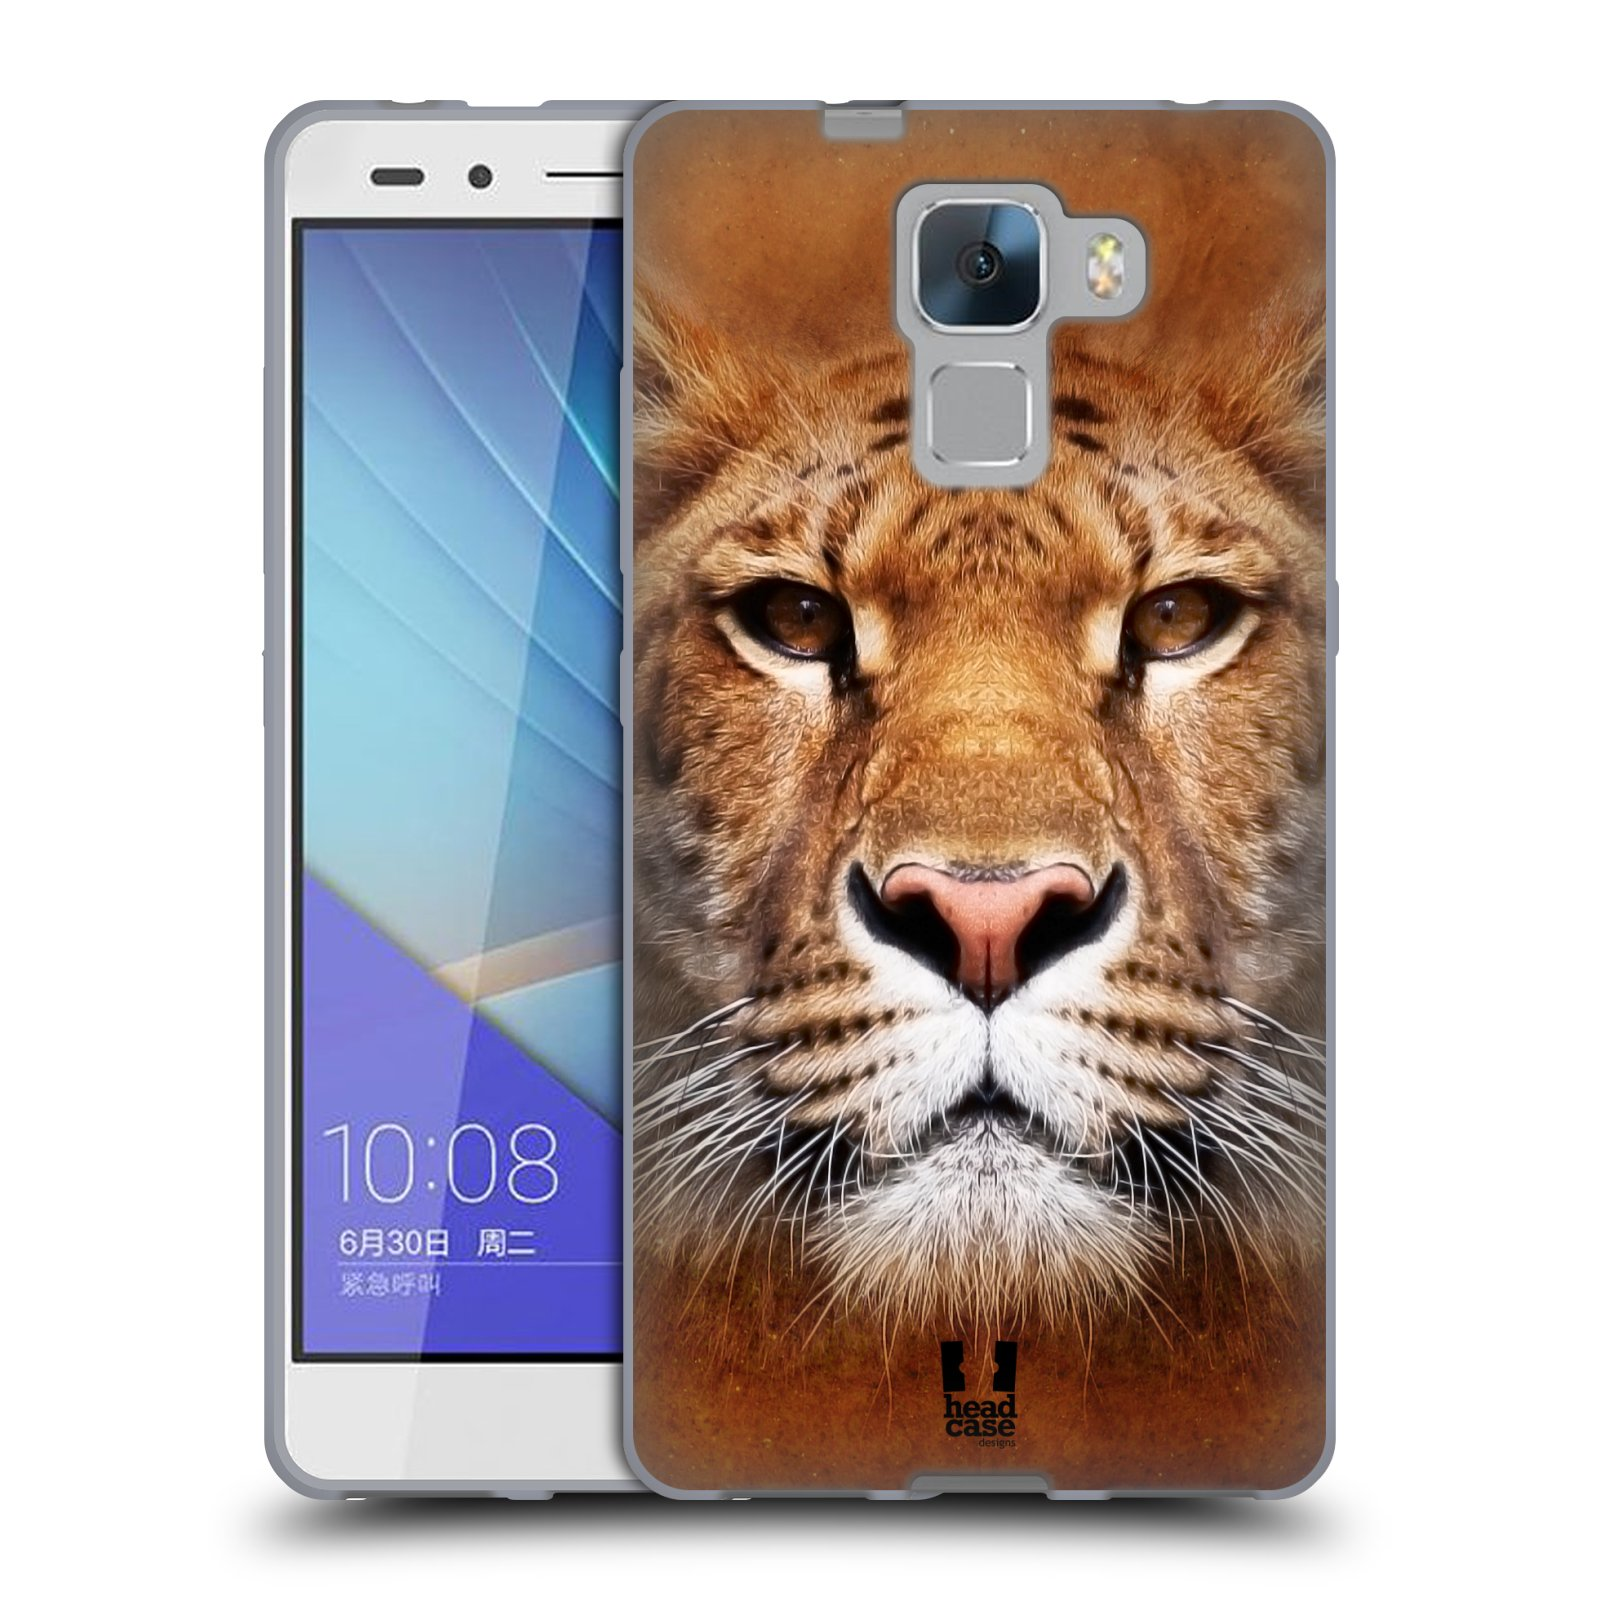 Silikonové pouzdro na mobil Honor 7 HEAD CASE TVÁŘ LIGER